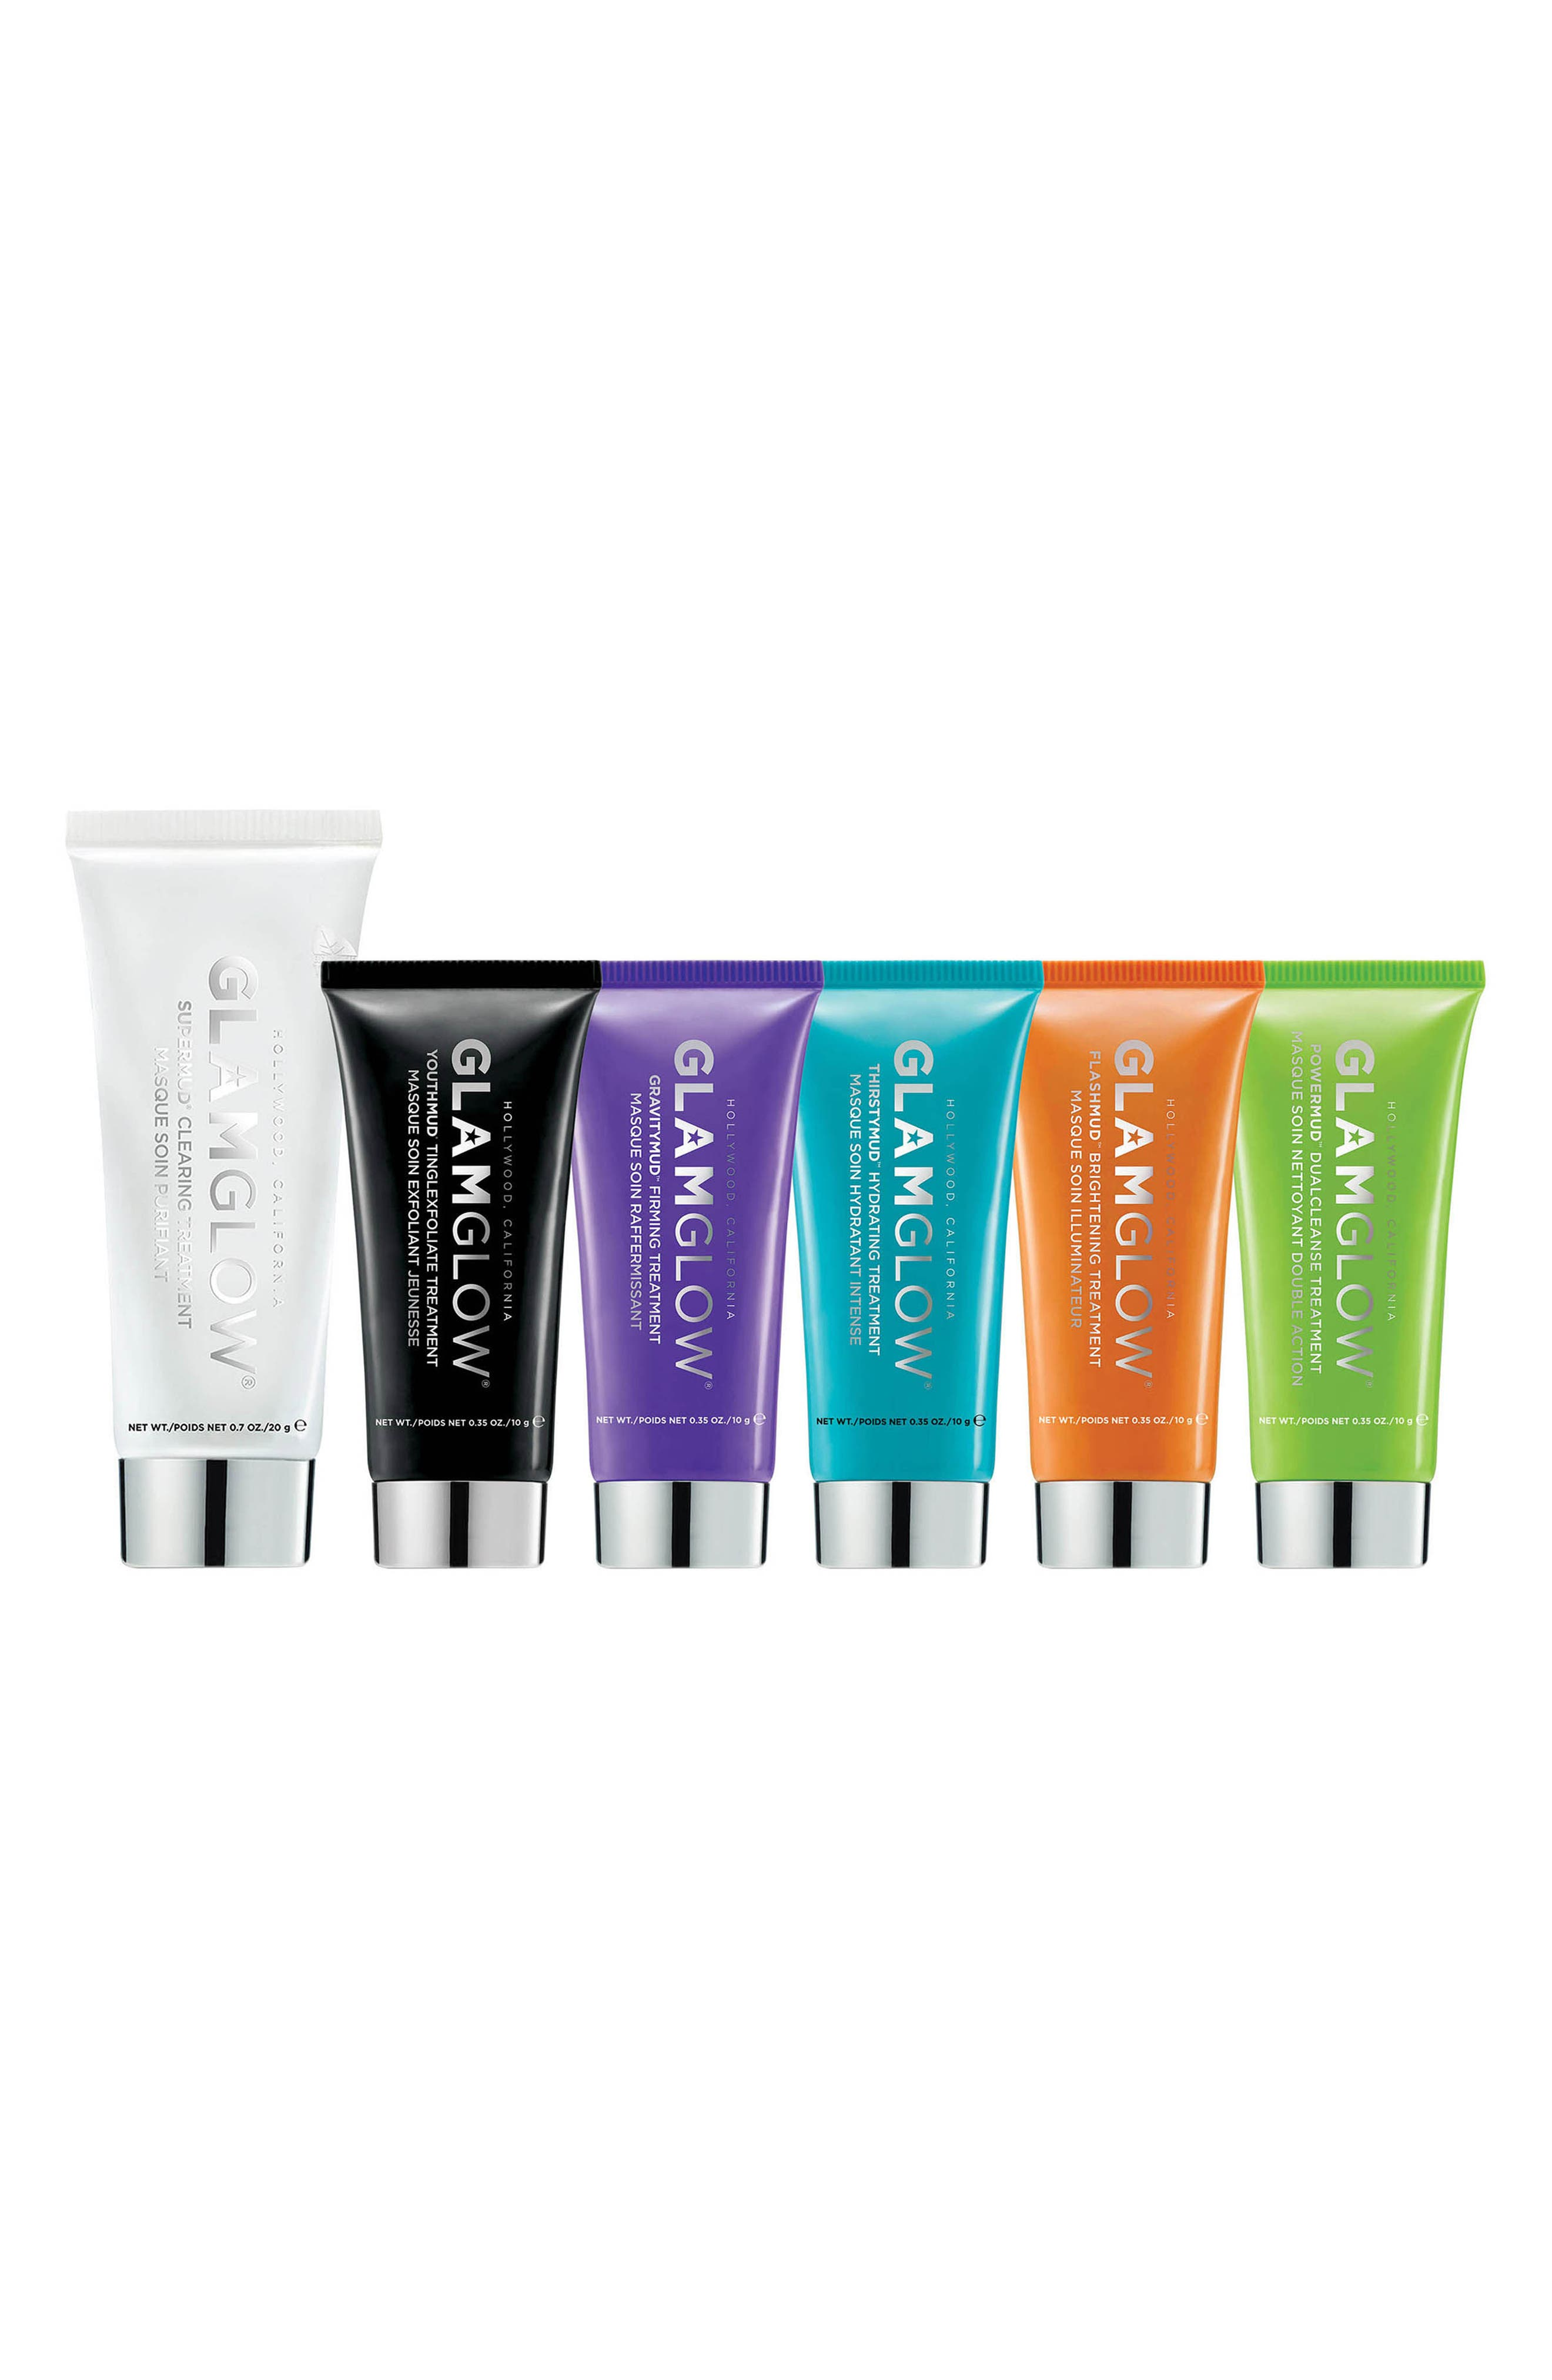 Multimasking Mask Treatment Set,                         Main,                         color, No Color